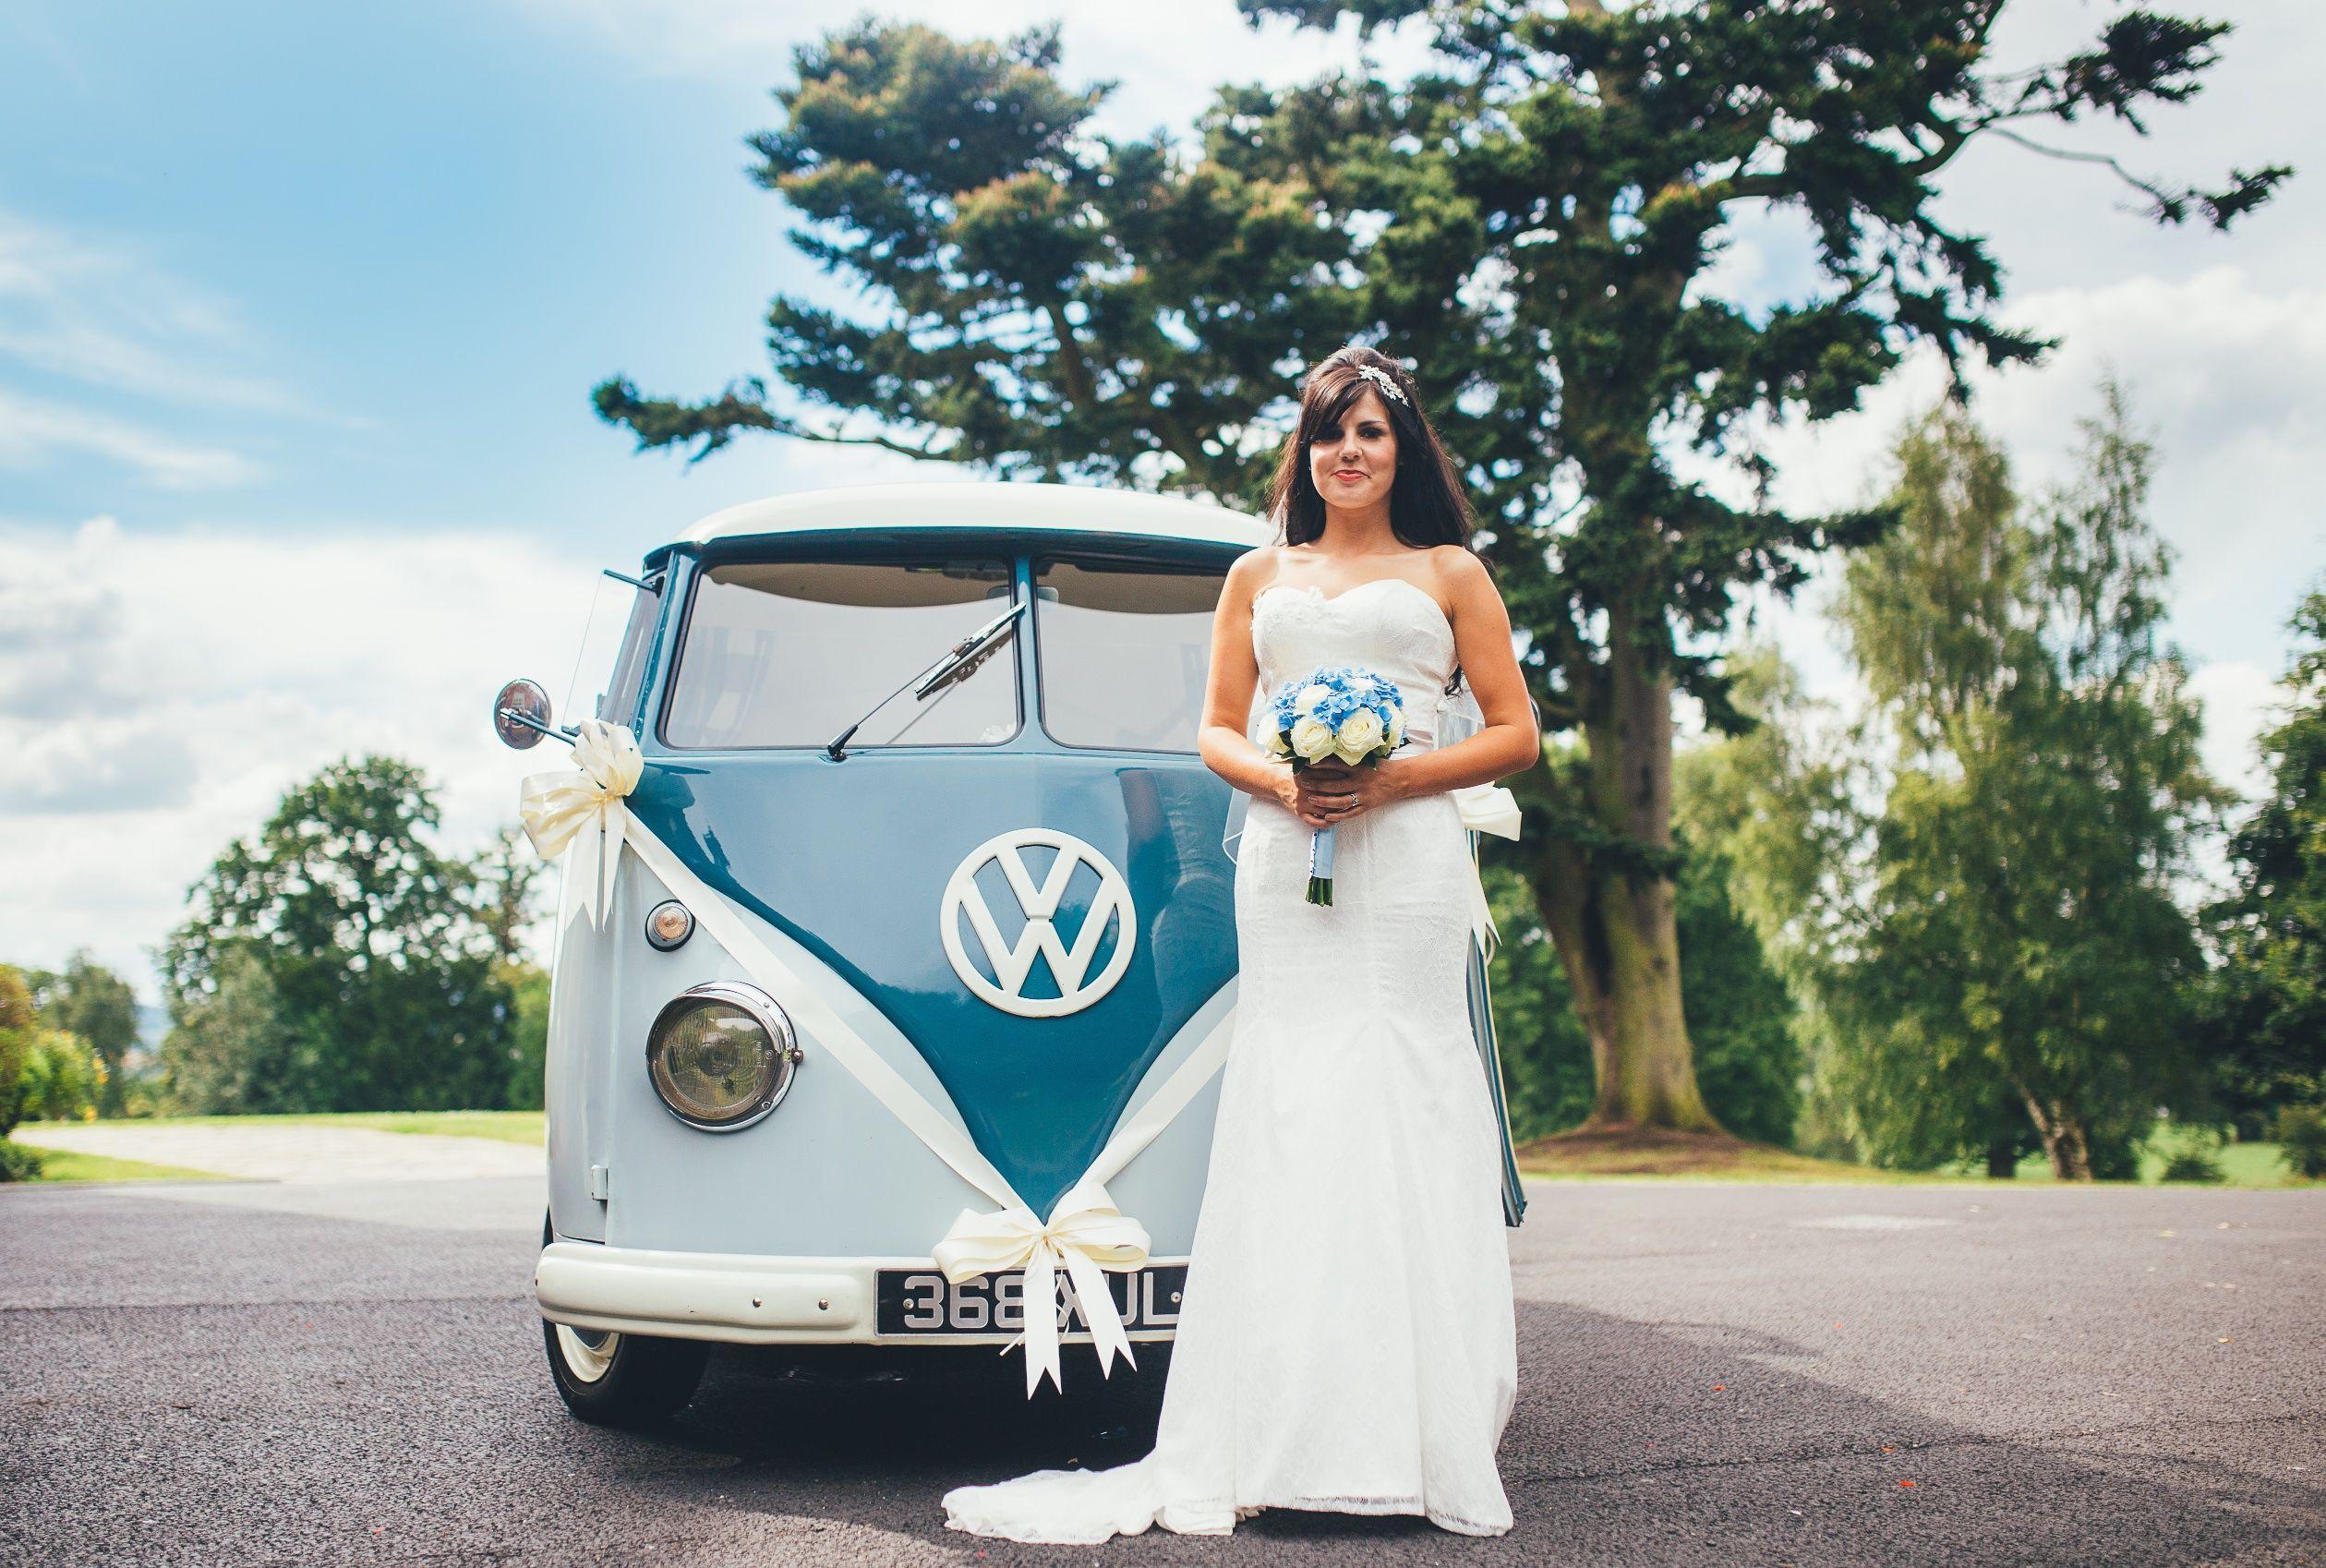 Blue Pumpkin VW Wedding Hire . Beach themed wedding car for ...